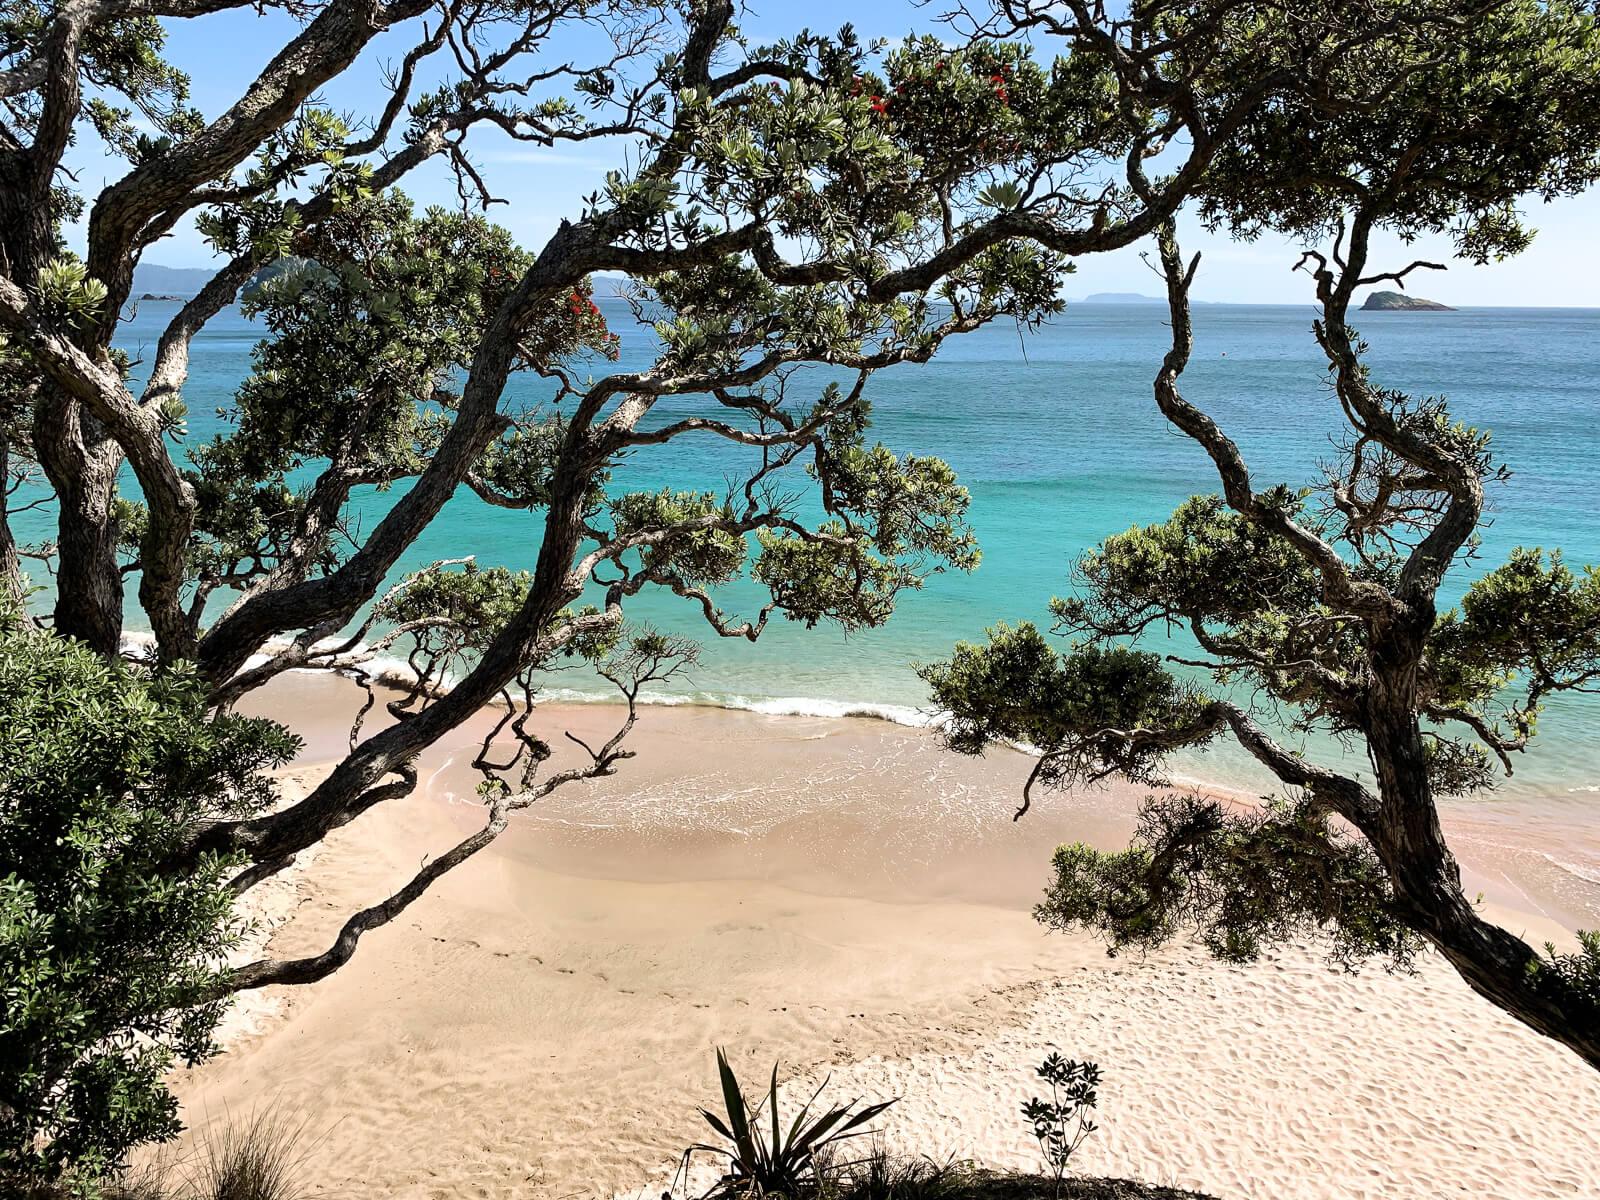 Mooiste stranden Nieuw-Zeeland - Hahei Beach